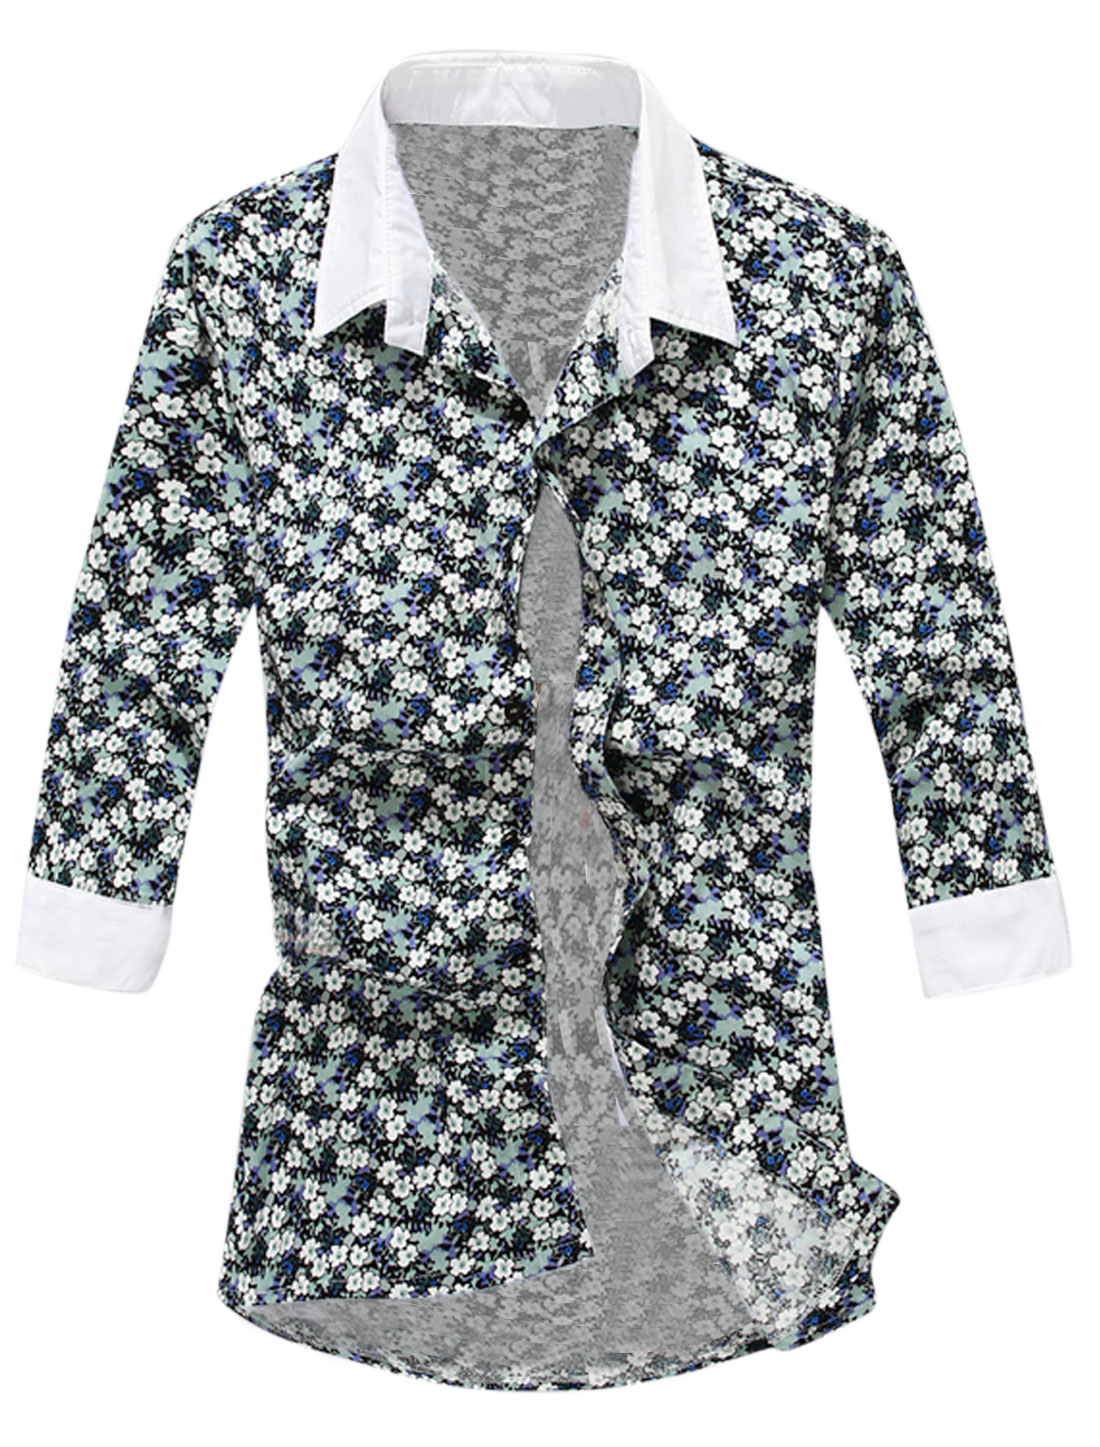 Buttons Cuffs Flower Pattern Stylish Shirt for Men Light Green White M